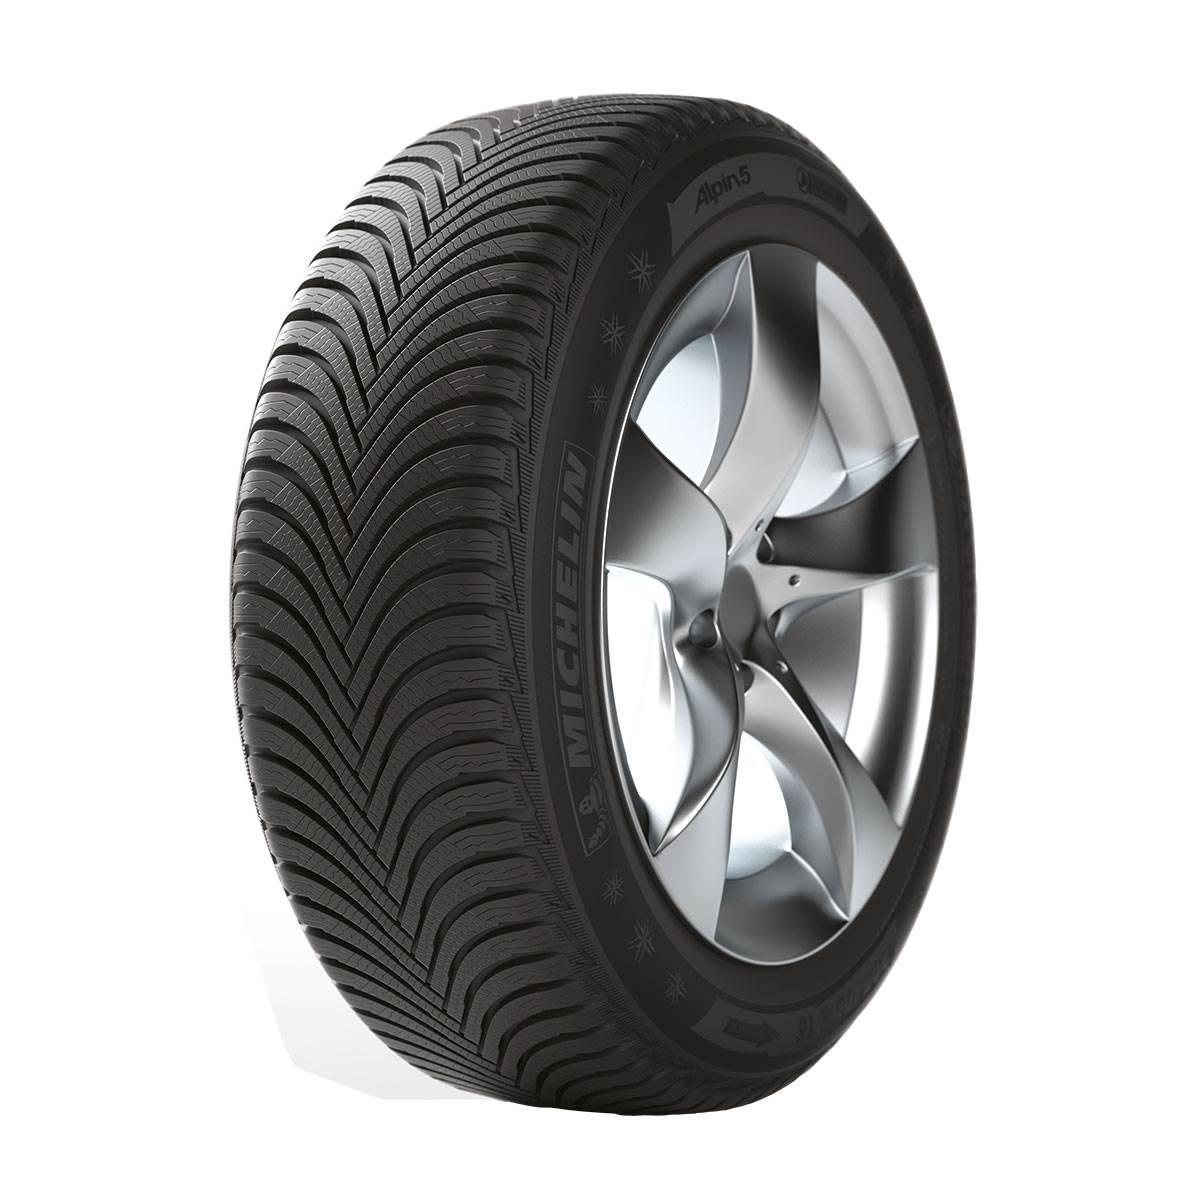 Pneu Hiver Michelin 205/55R16 94V Alpin A5 XL